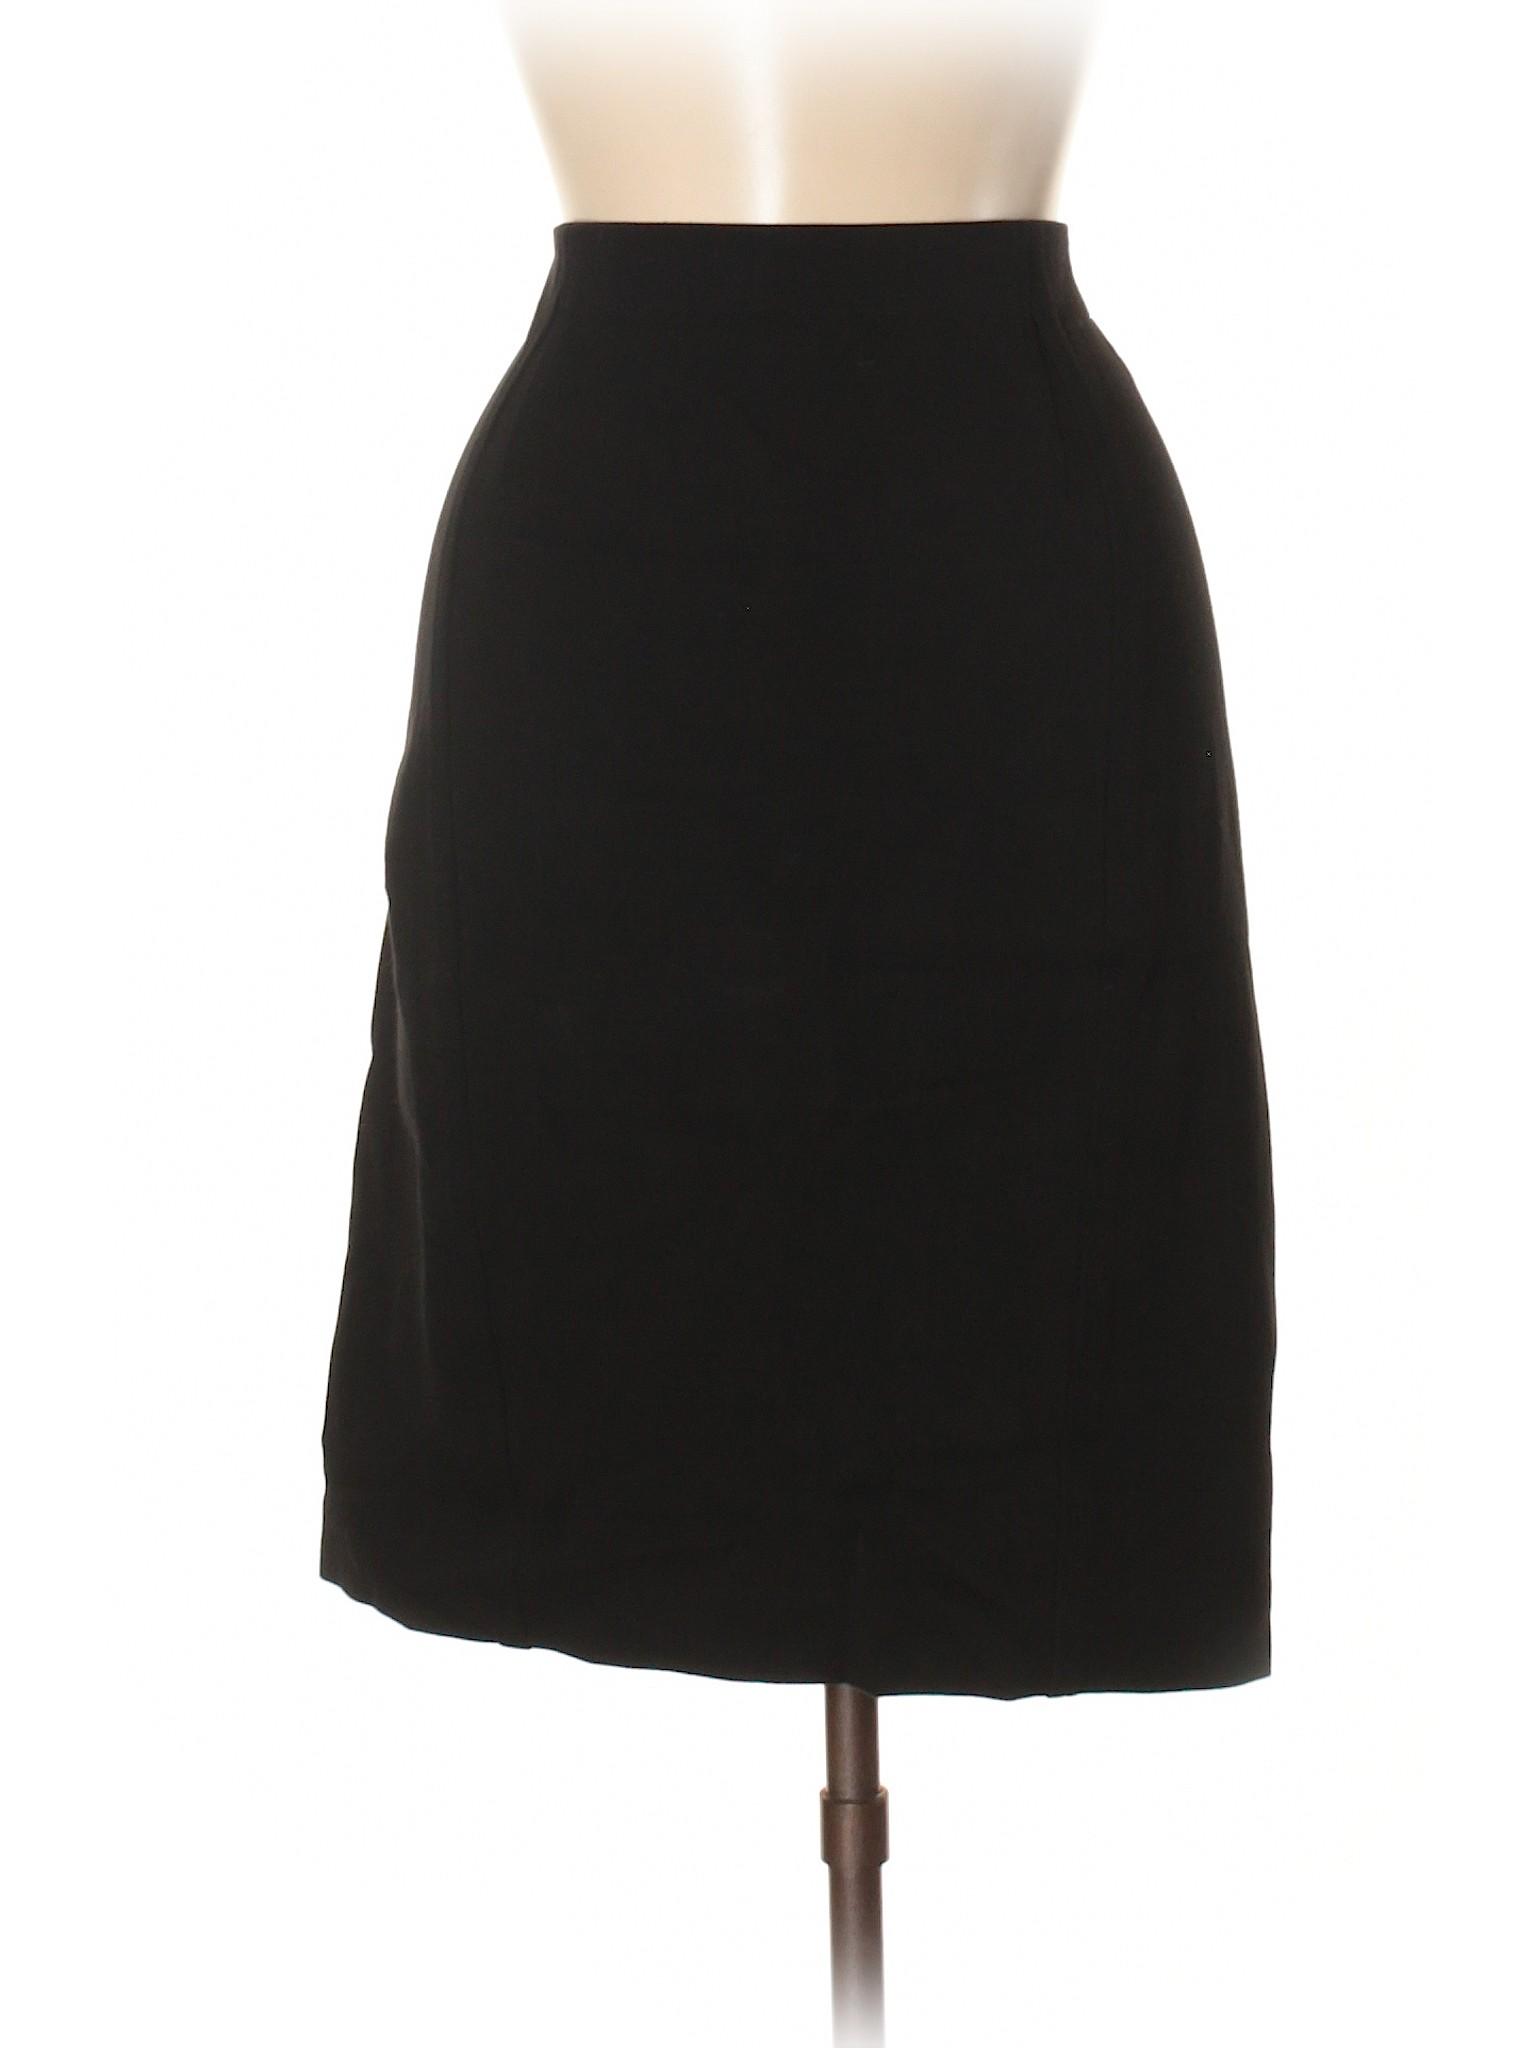 Boutique Casual Casual Skirt Skirt Skirt Casual Casual Skirt Skirt Boutique Casual Boutique Boutique Boutique Boutique pxq55wABC